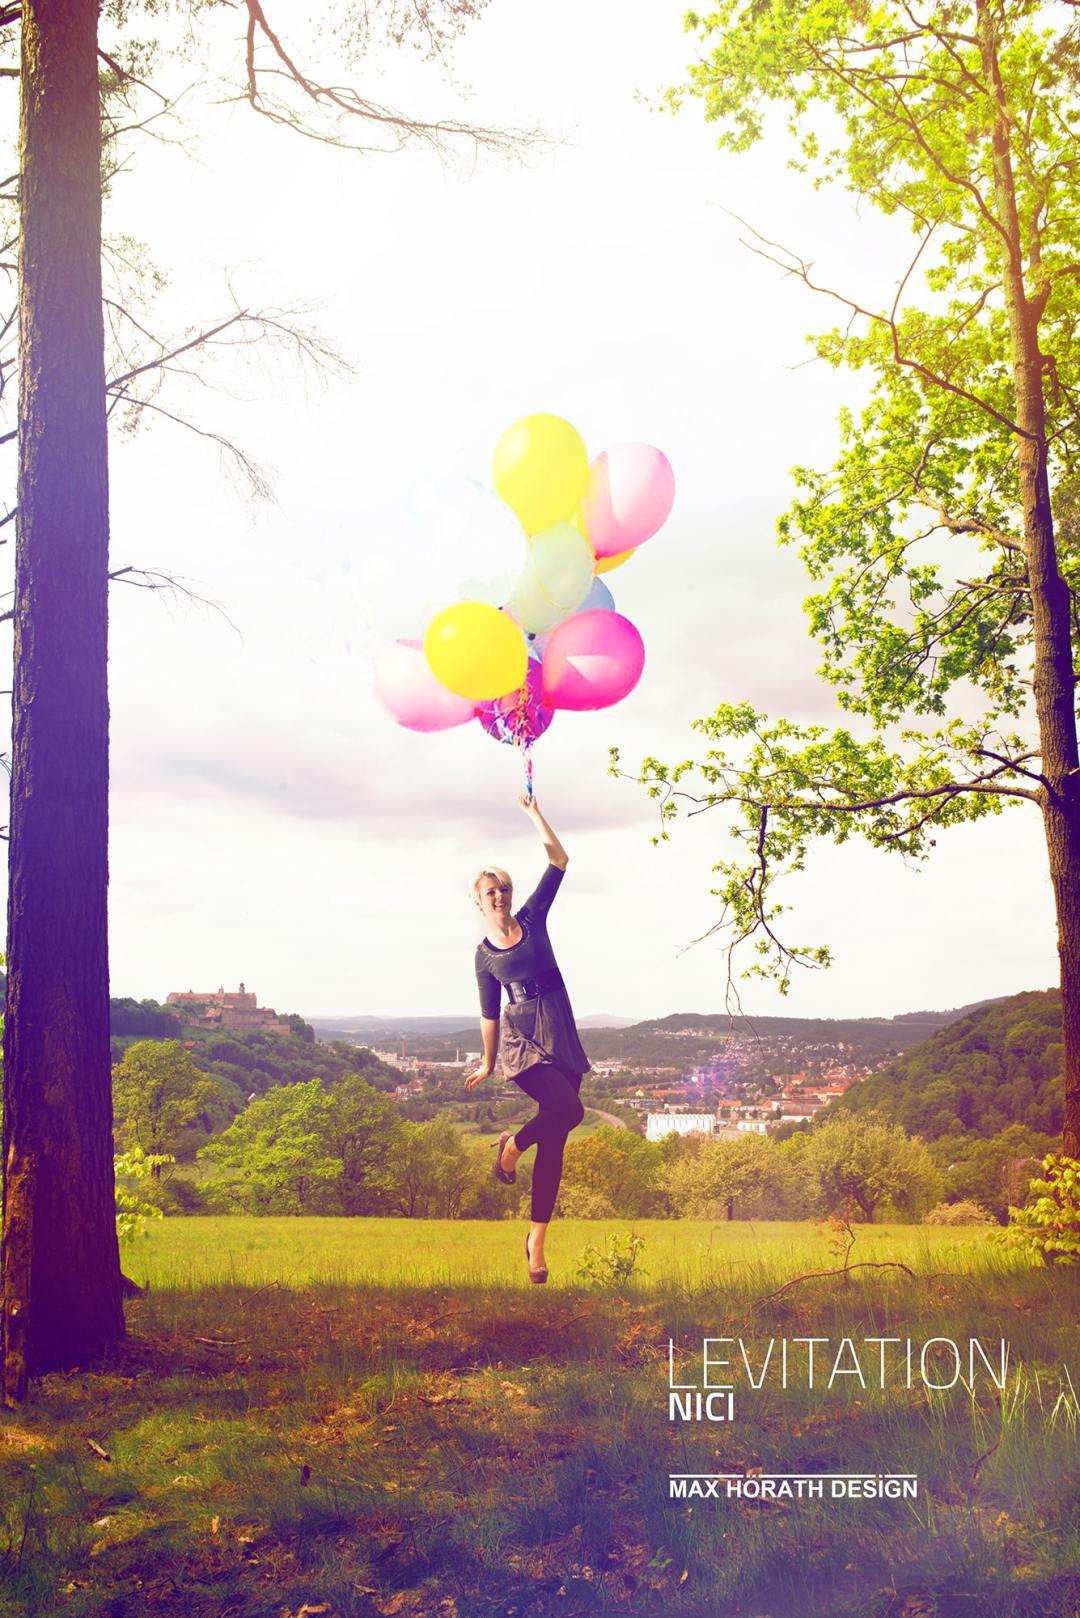 Lavitation-Schwebende-Personen-Editorial-Fotoshooting-Fashion-Fotograf-Max-Hoerath-Design-Kulmbach-Bayreuth-Bamberg-coburg-Fotokurs-Nuernberg